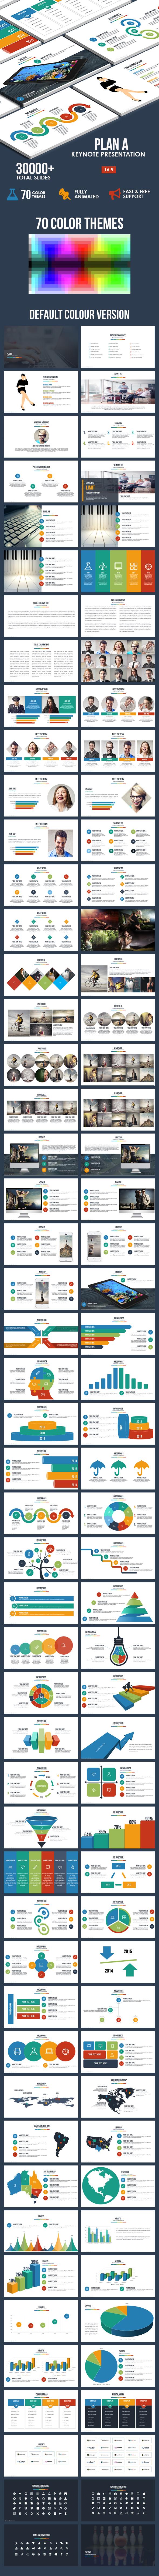 Plan A Keynote Template - Business Keynote Templates